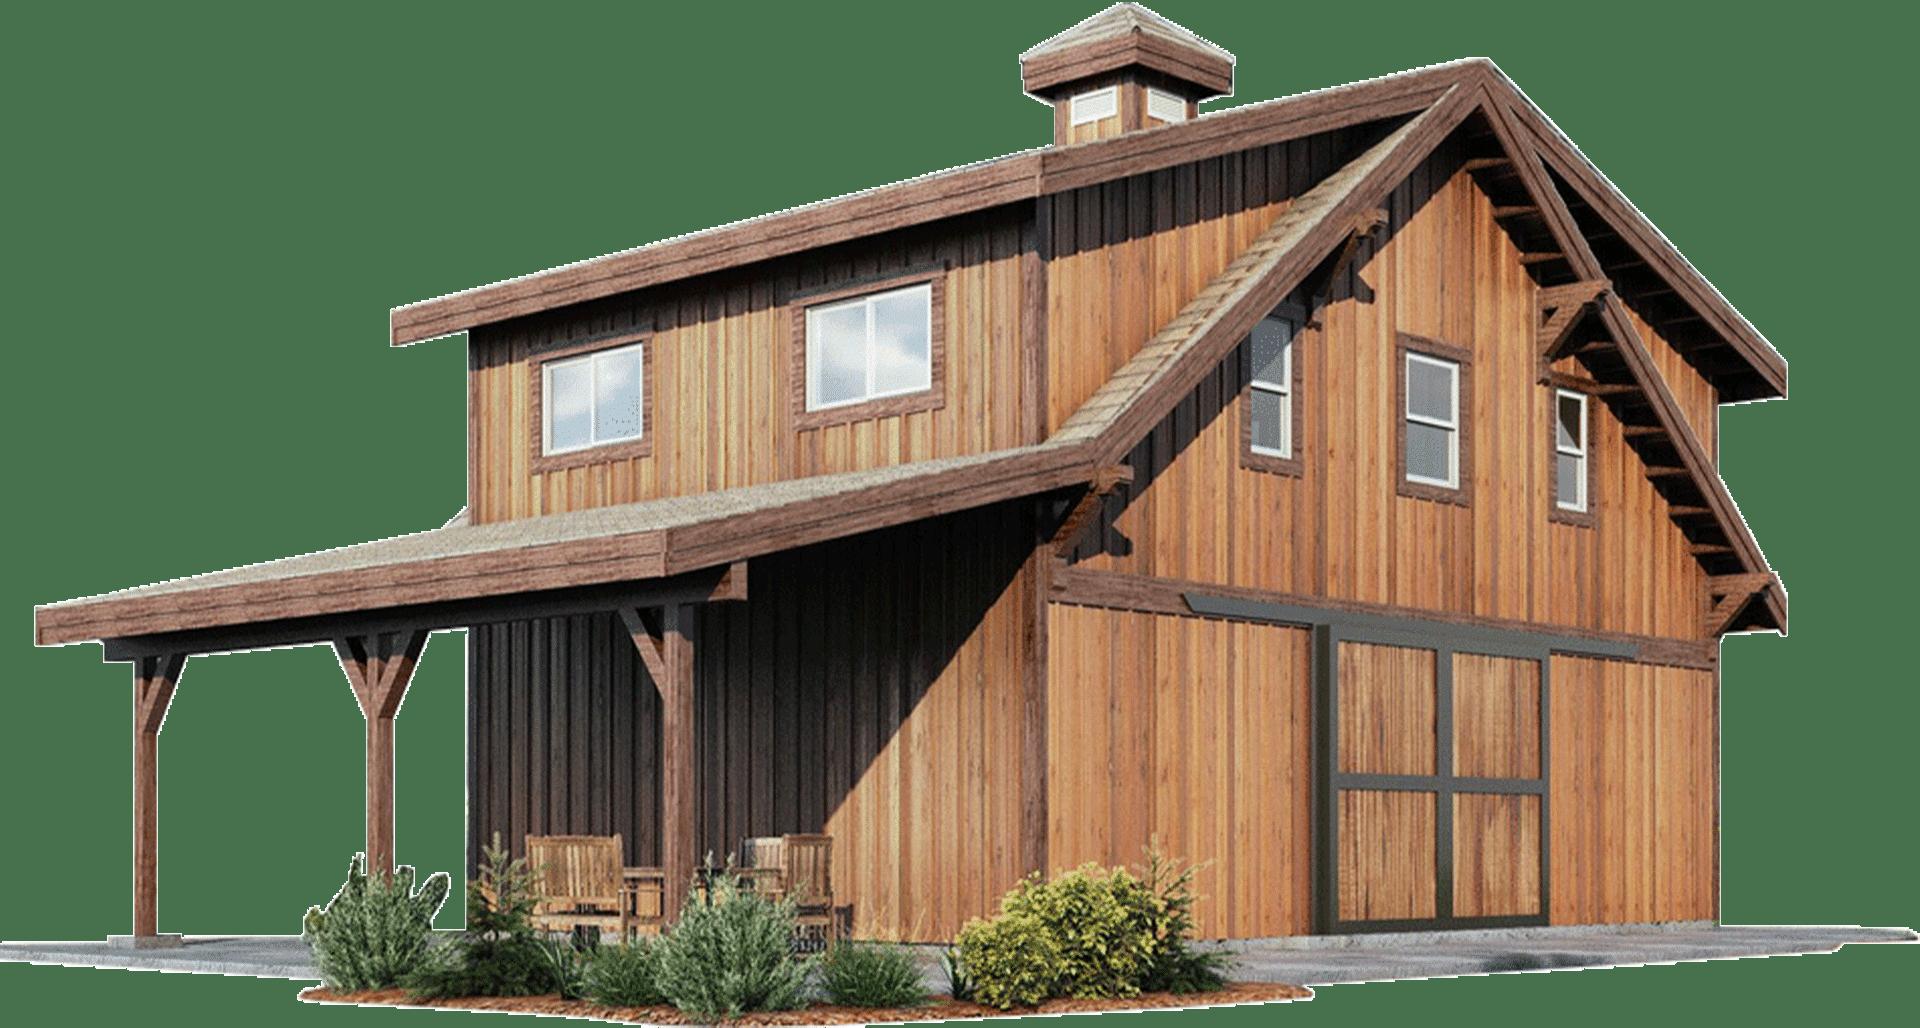 Oakridge Apartment Barn Kit Wood Barn Home Kit Dc Structures Barn House Kits Barn House Small Barn Home